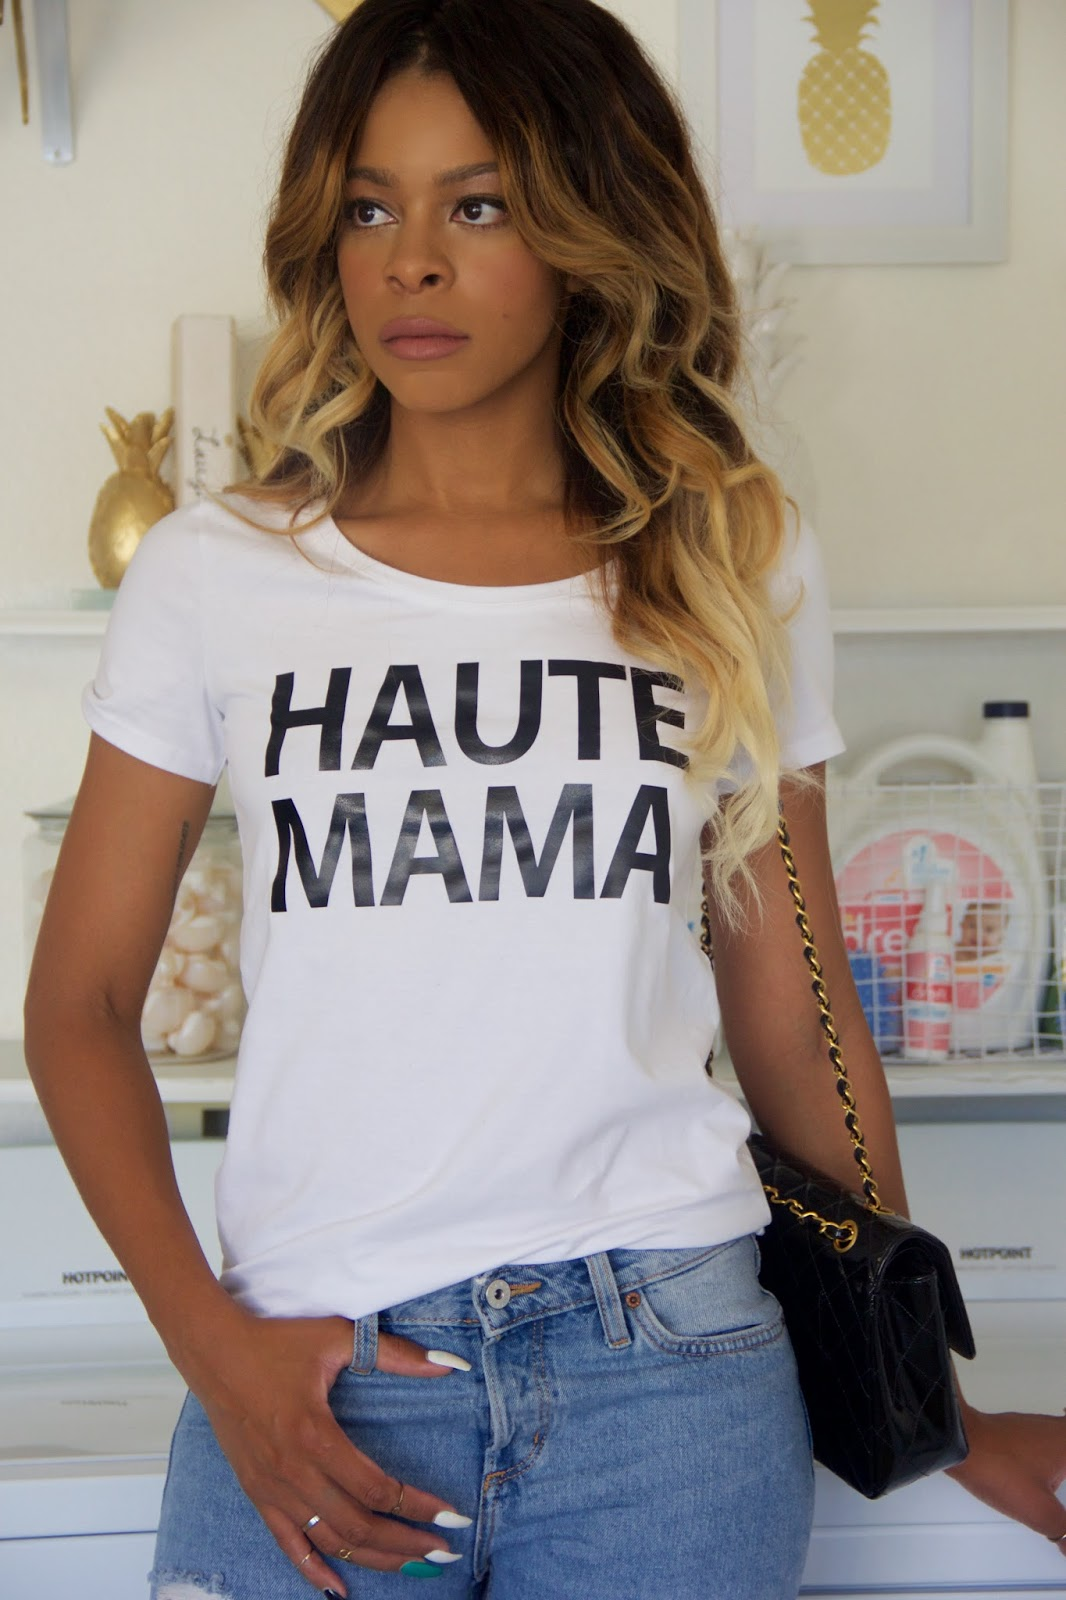 shop bottle blonde, haute mama t shirt, allthingsslim, all things slim, mommy t shirts, maternity t shirts